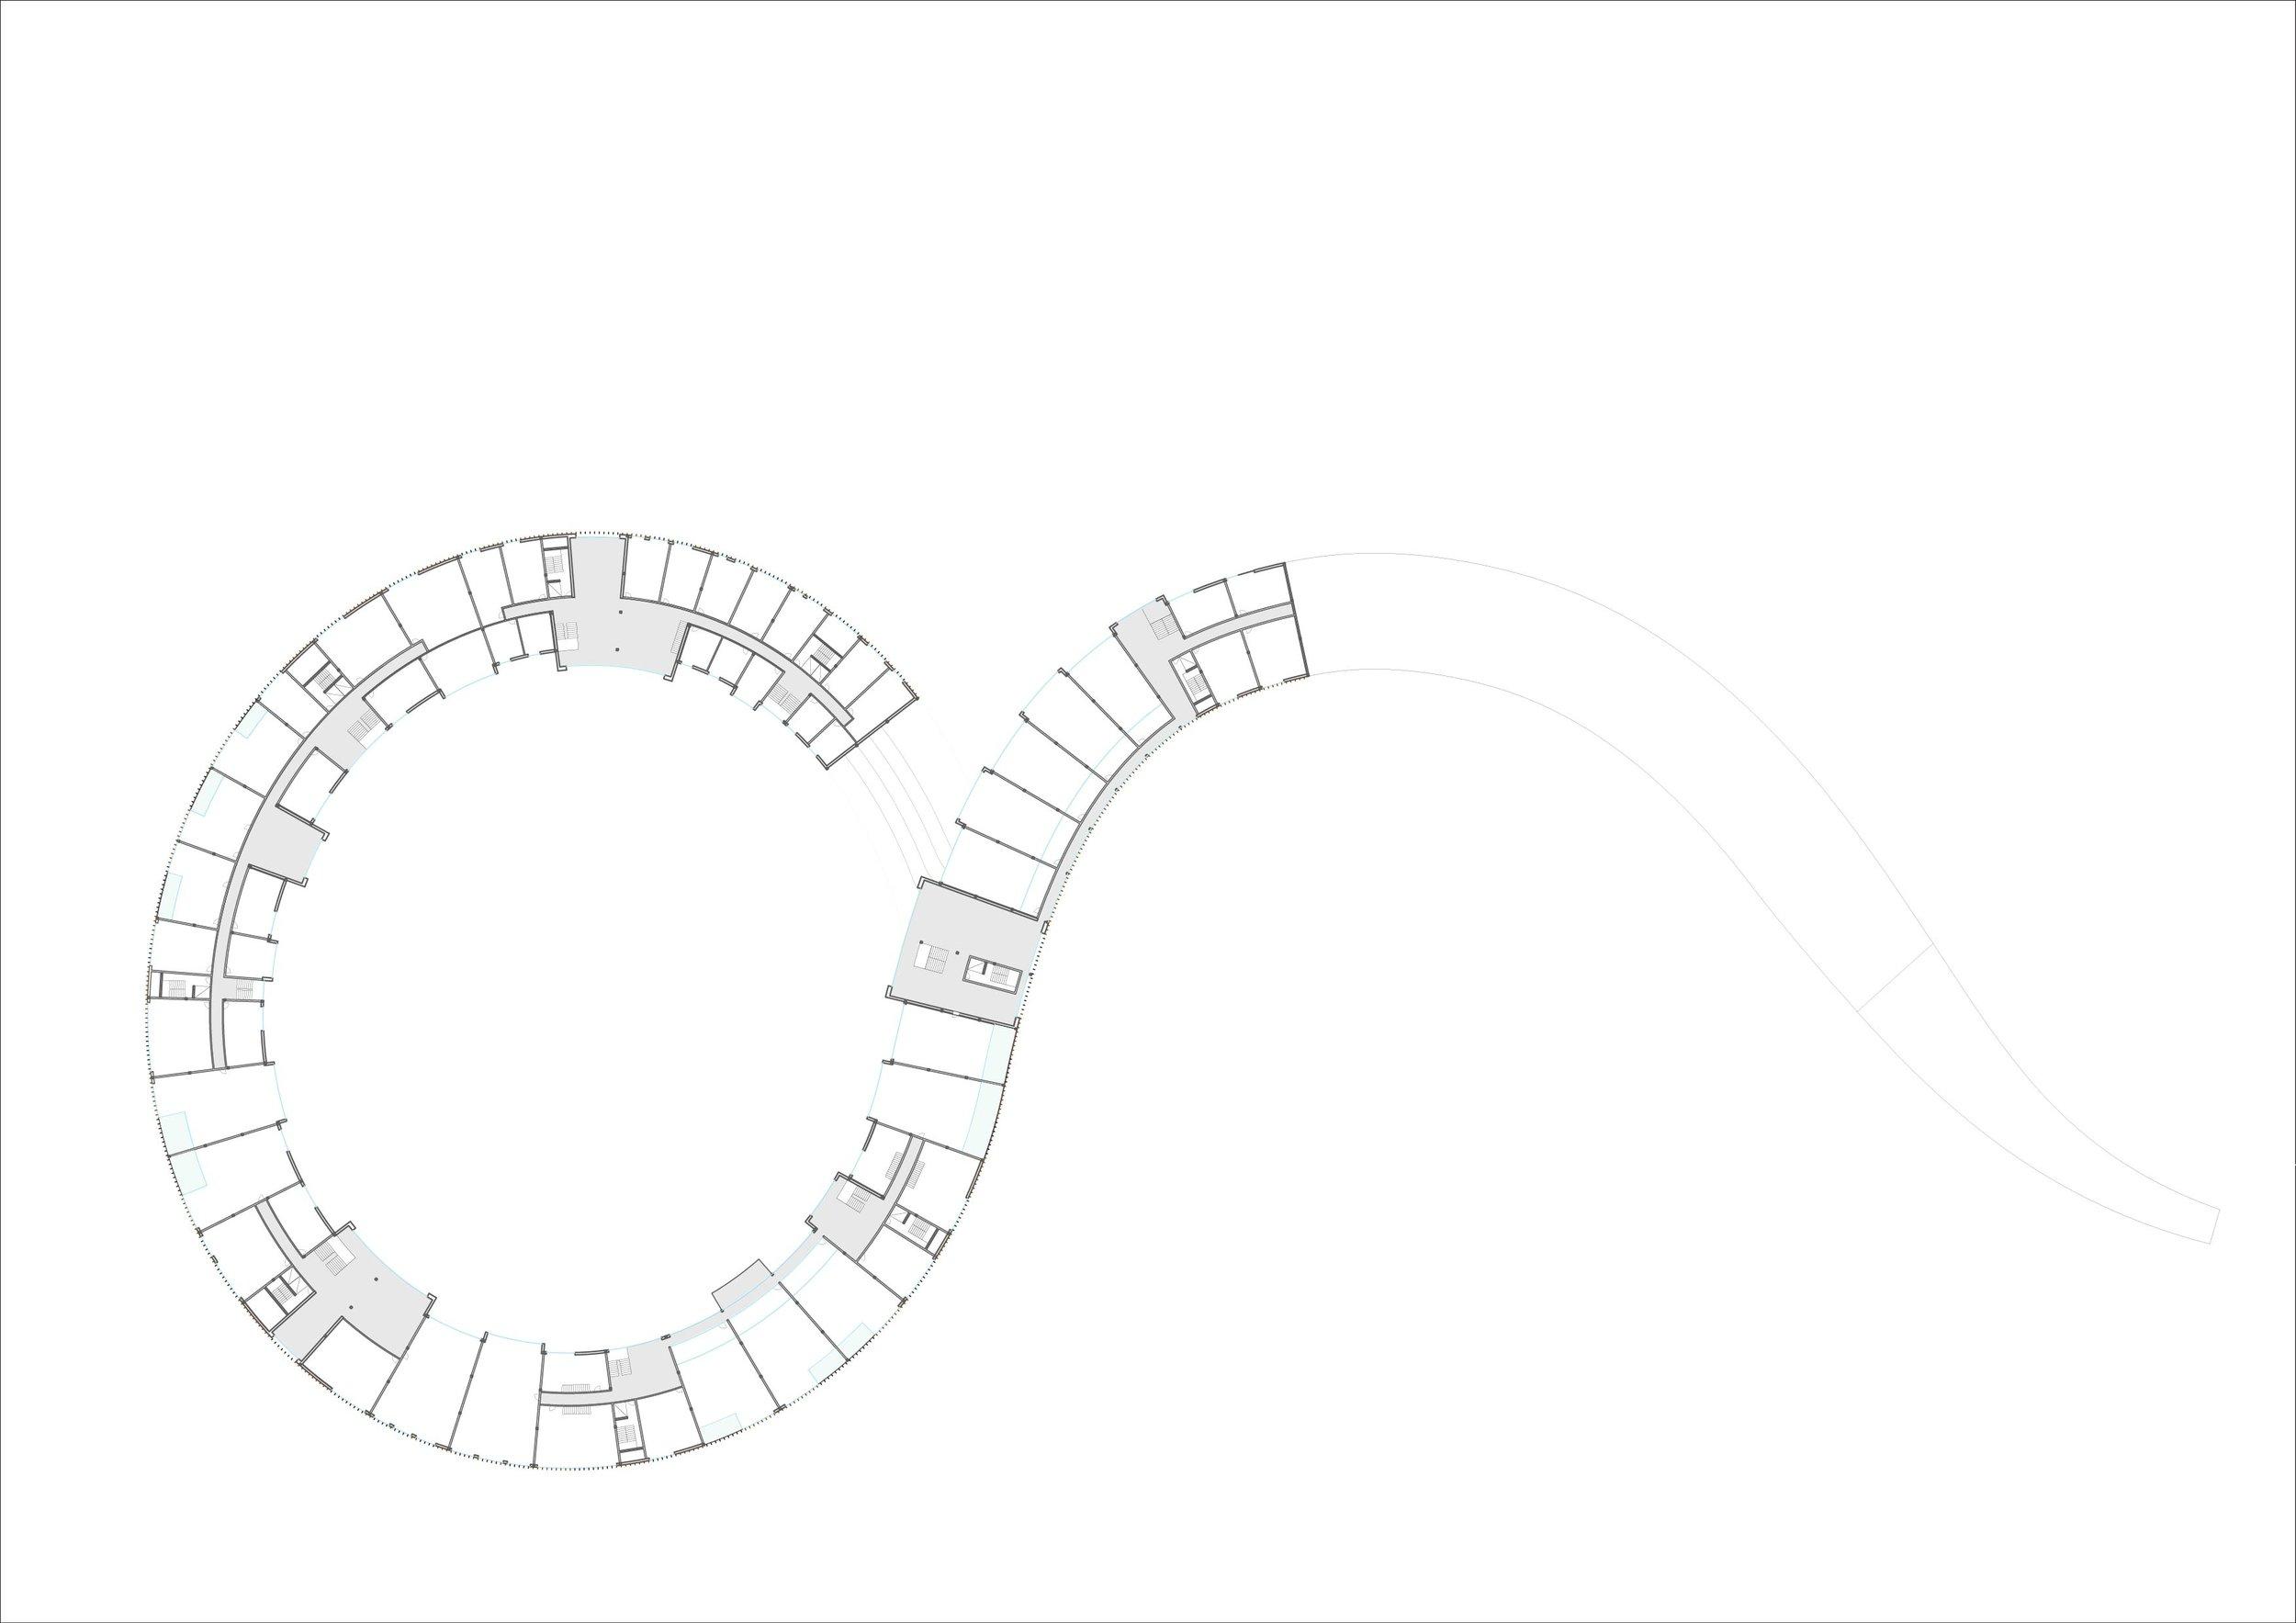 1-500 BUILDING PLANS-03.jpg